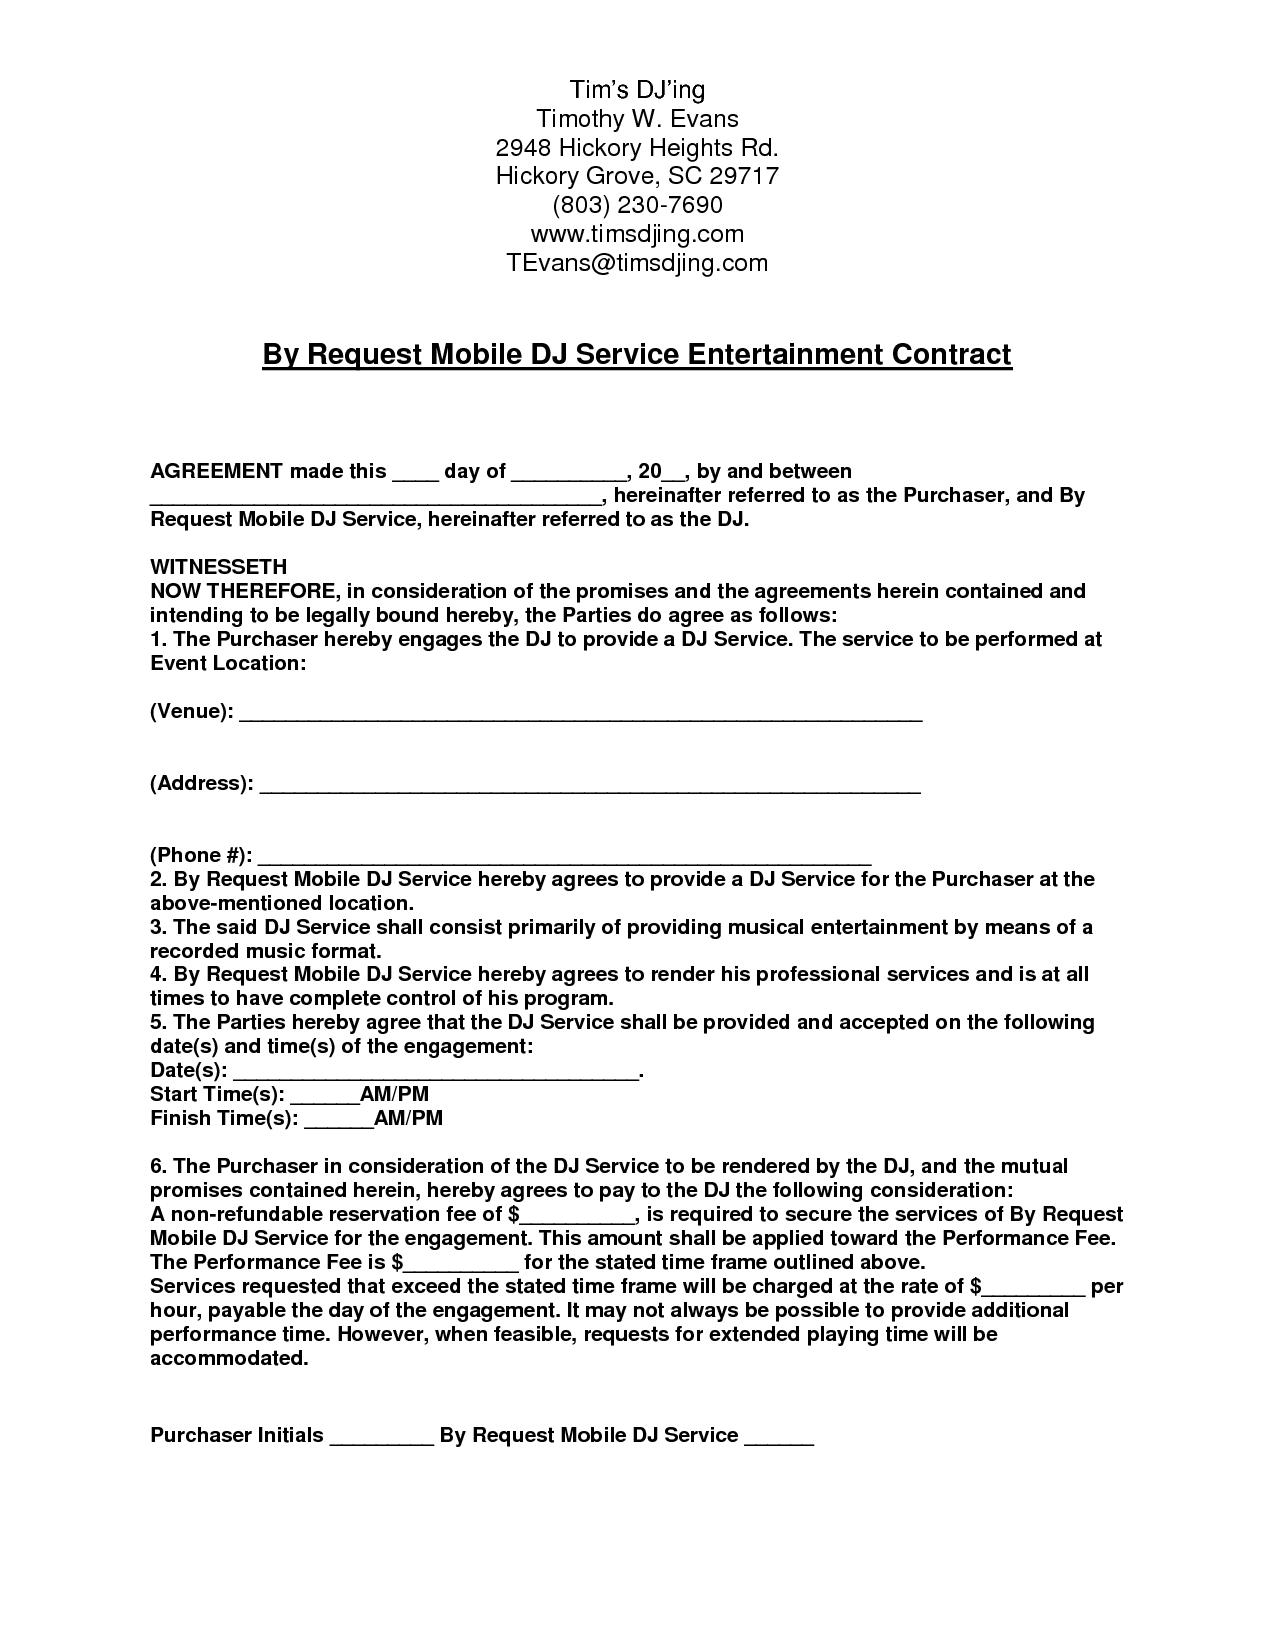 Mobile Dj Contract